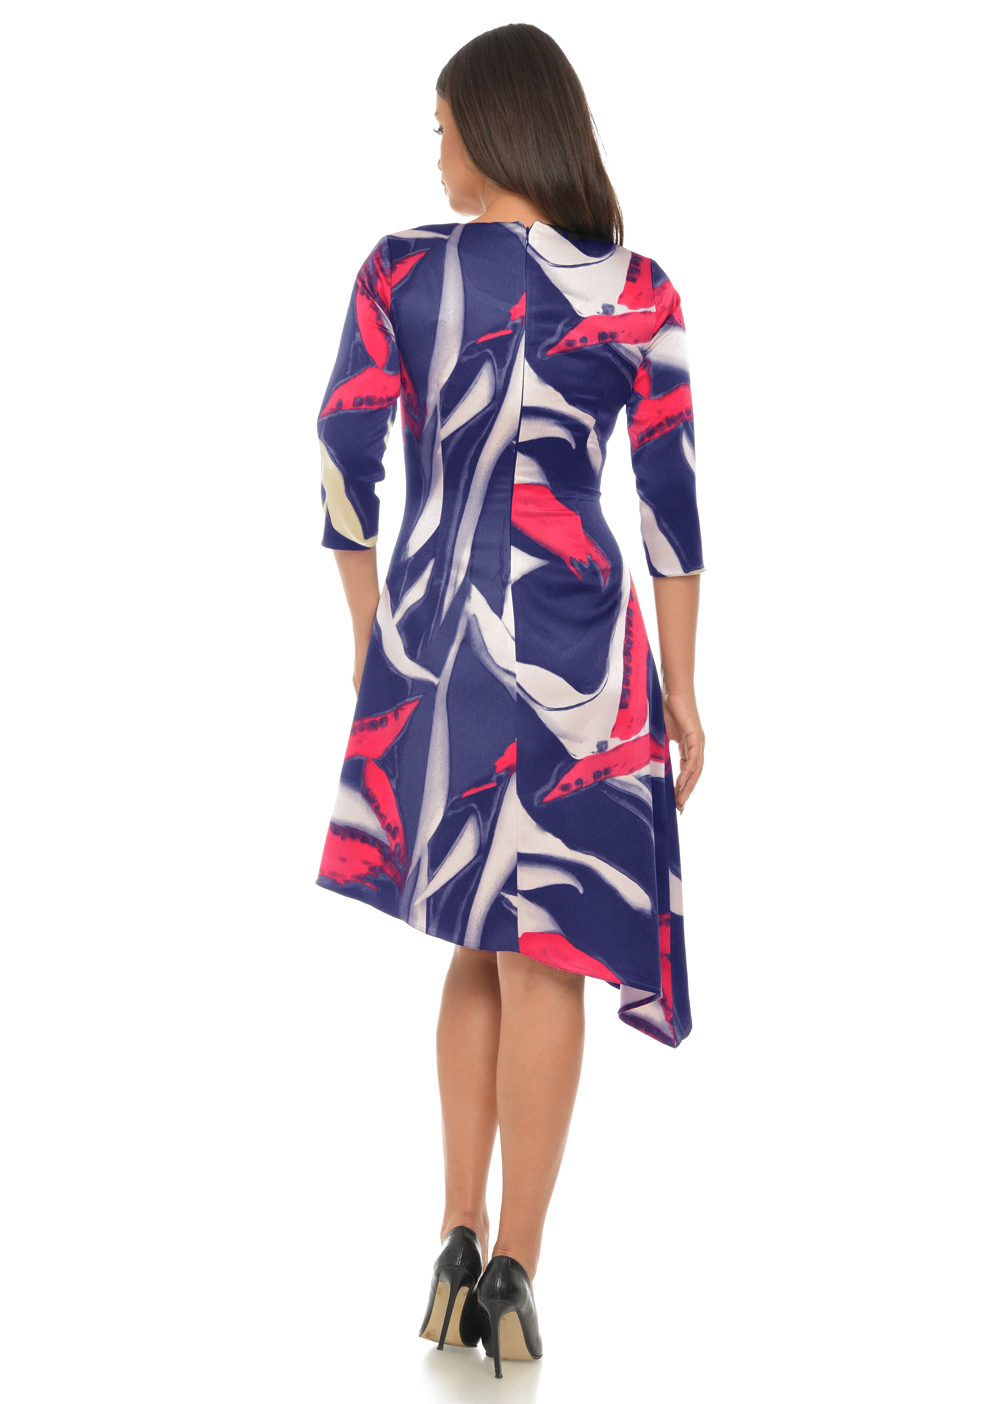 Rochie cu imprimeu abstract